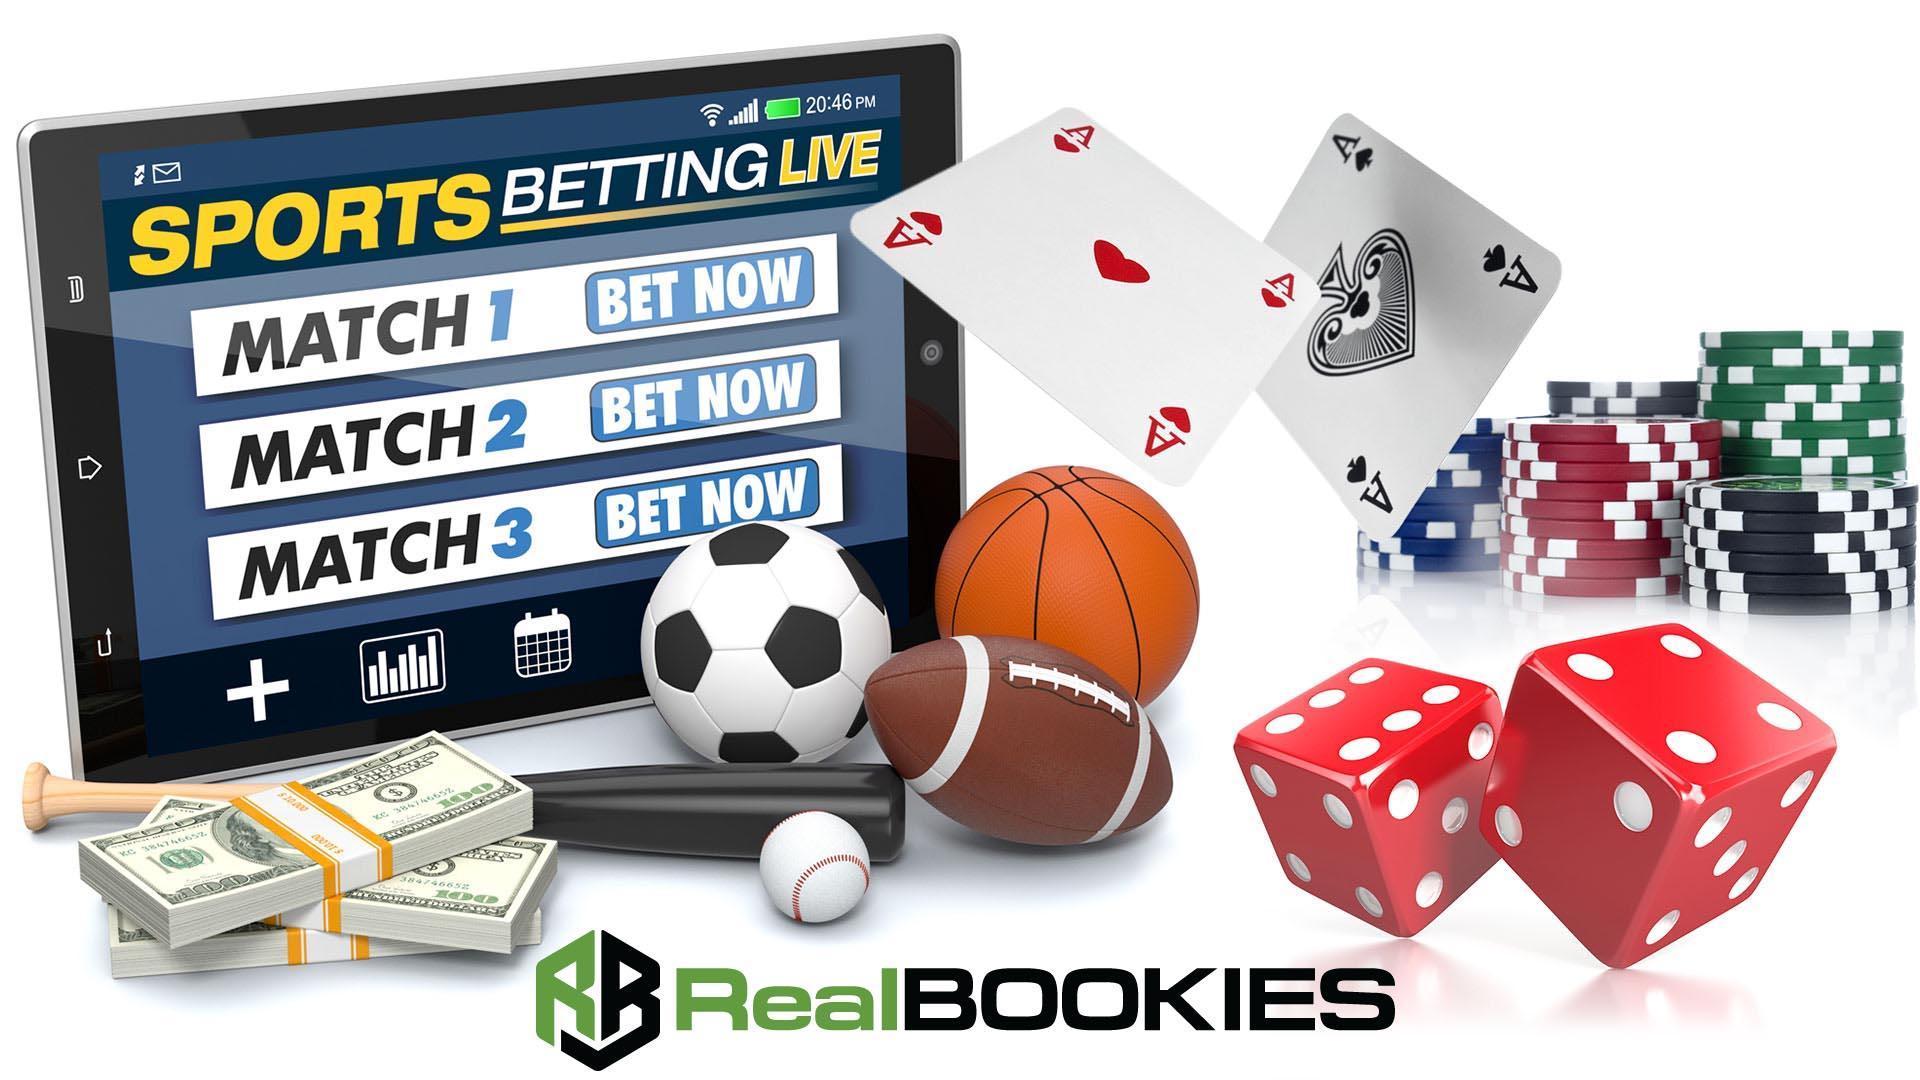 The Best Betting Service - CornerBookie.com